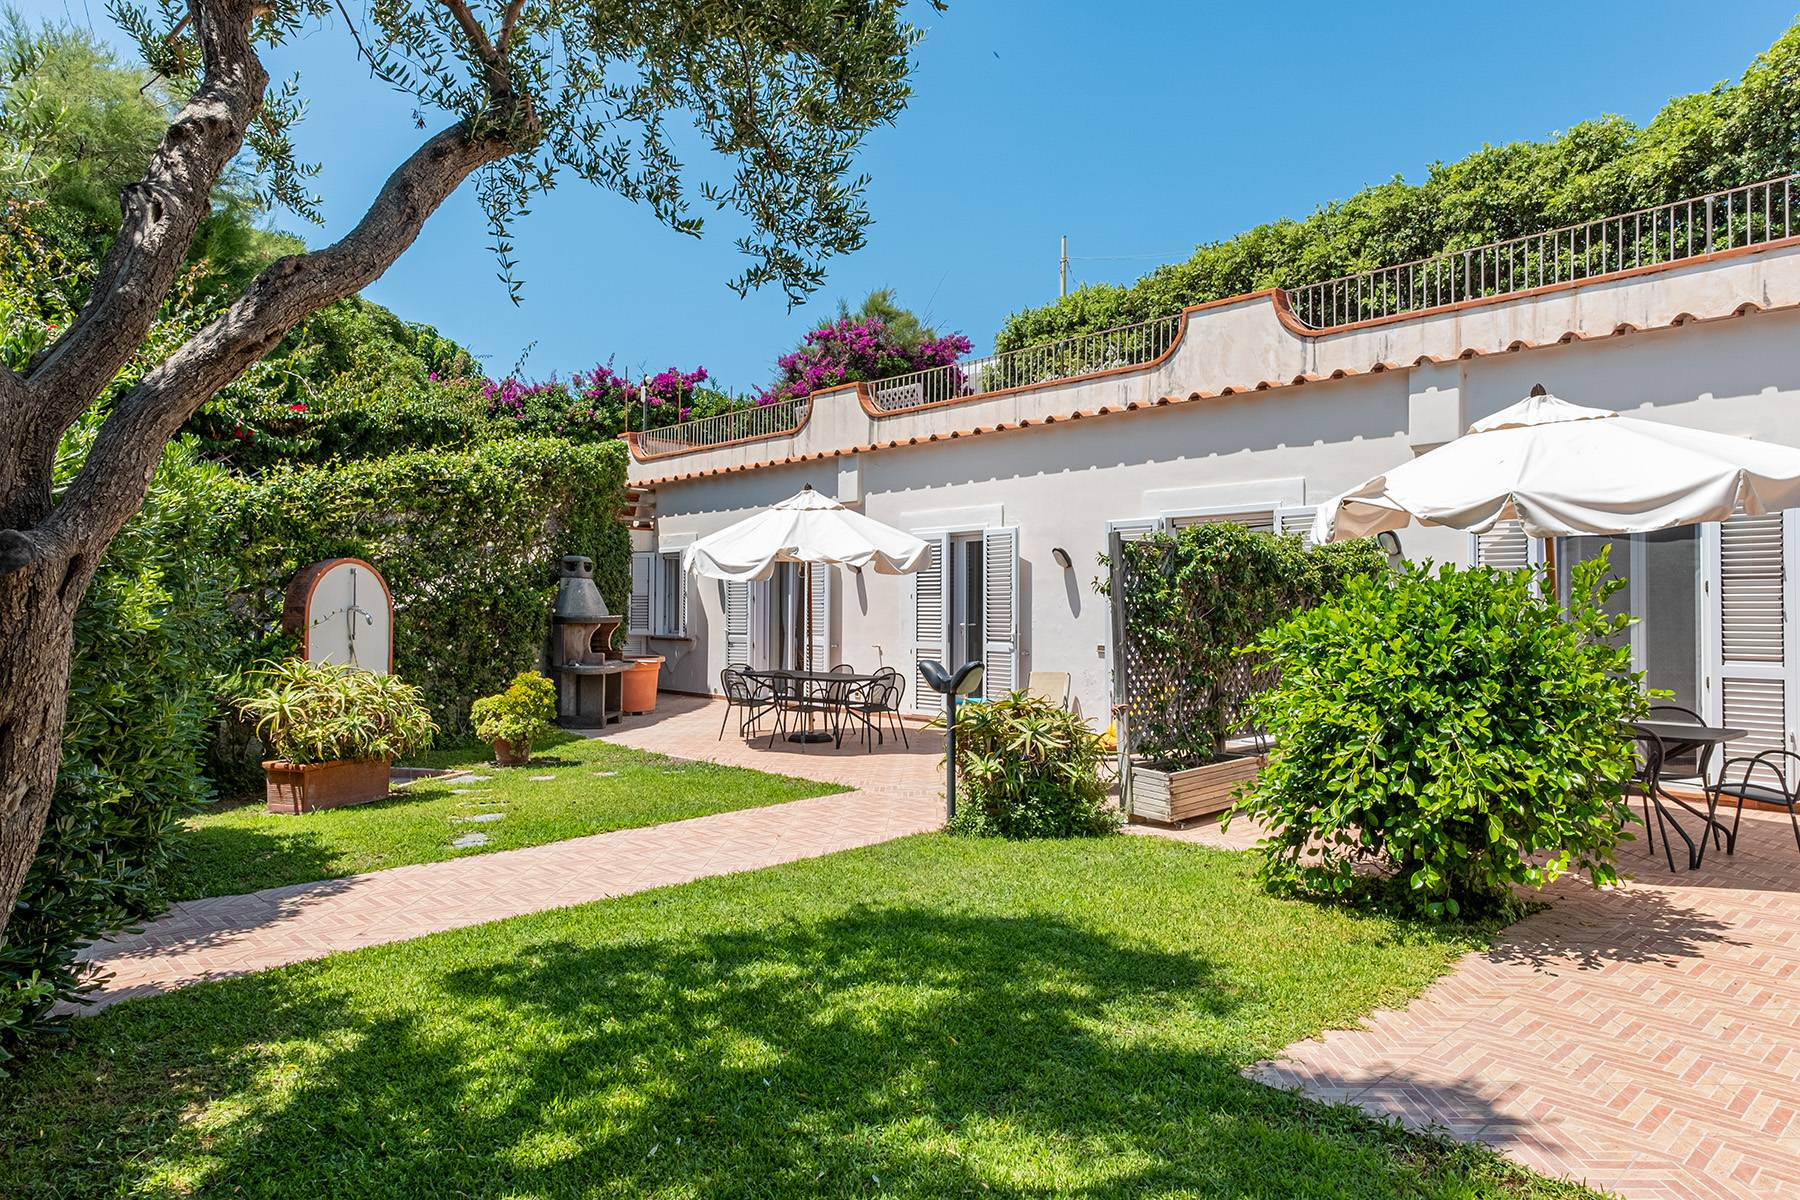 Villa in Vendita a Ischia: 5 locali, 400 mq - Foto 22